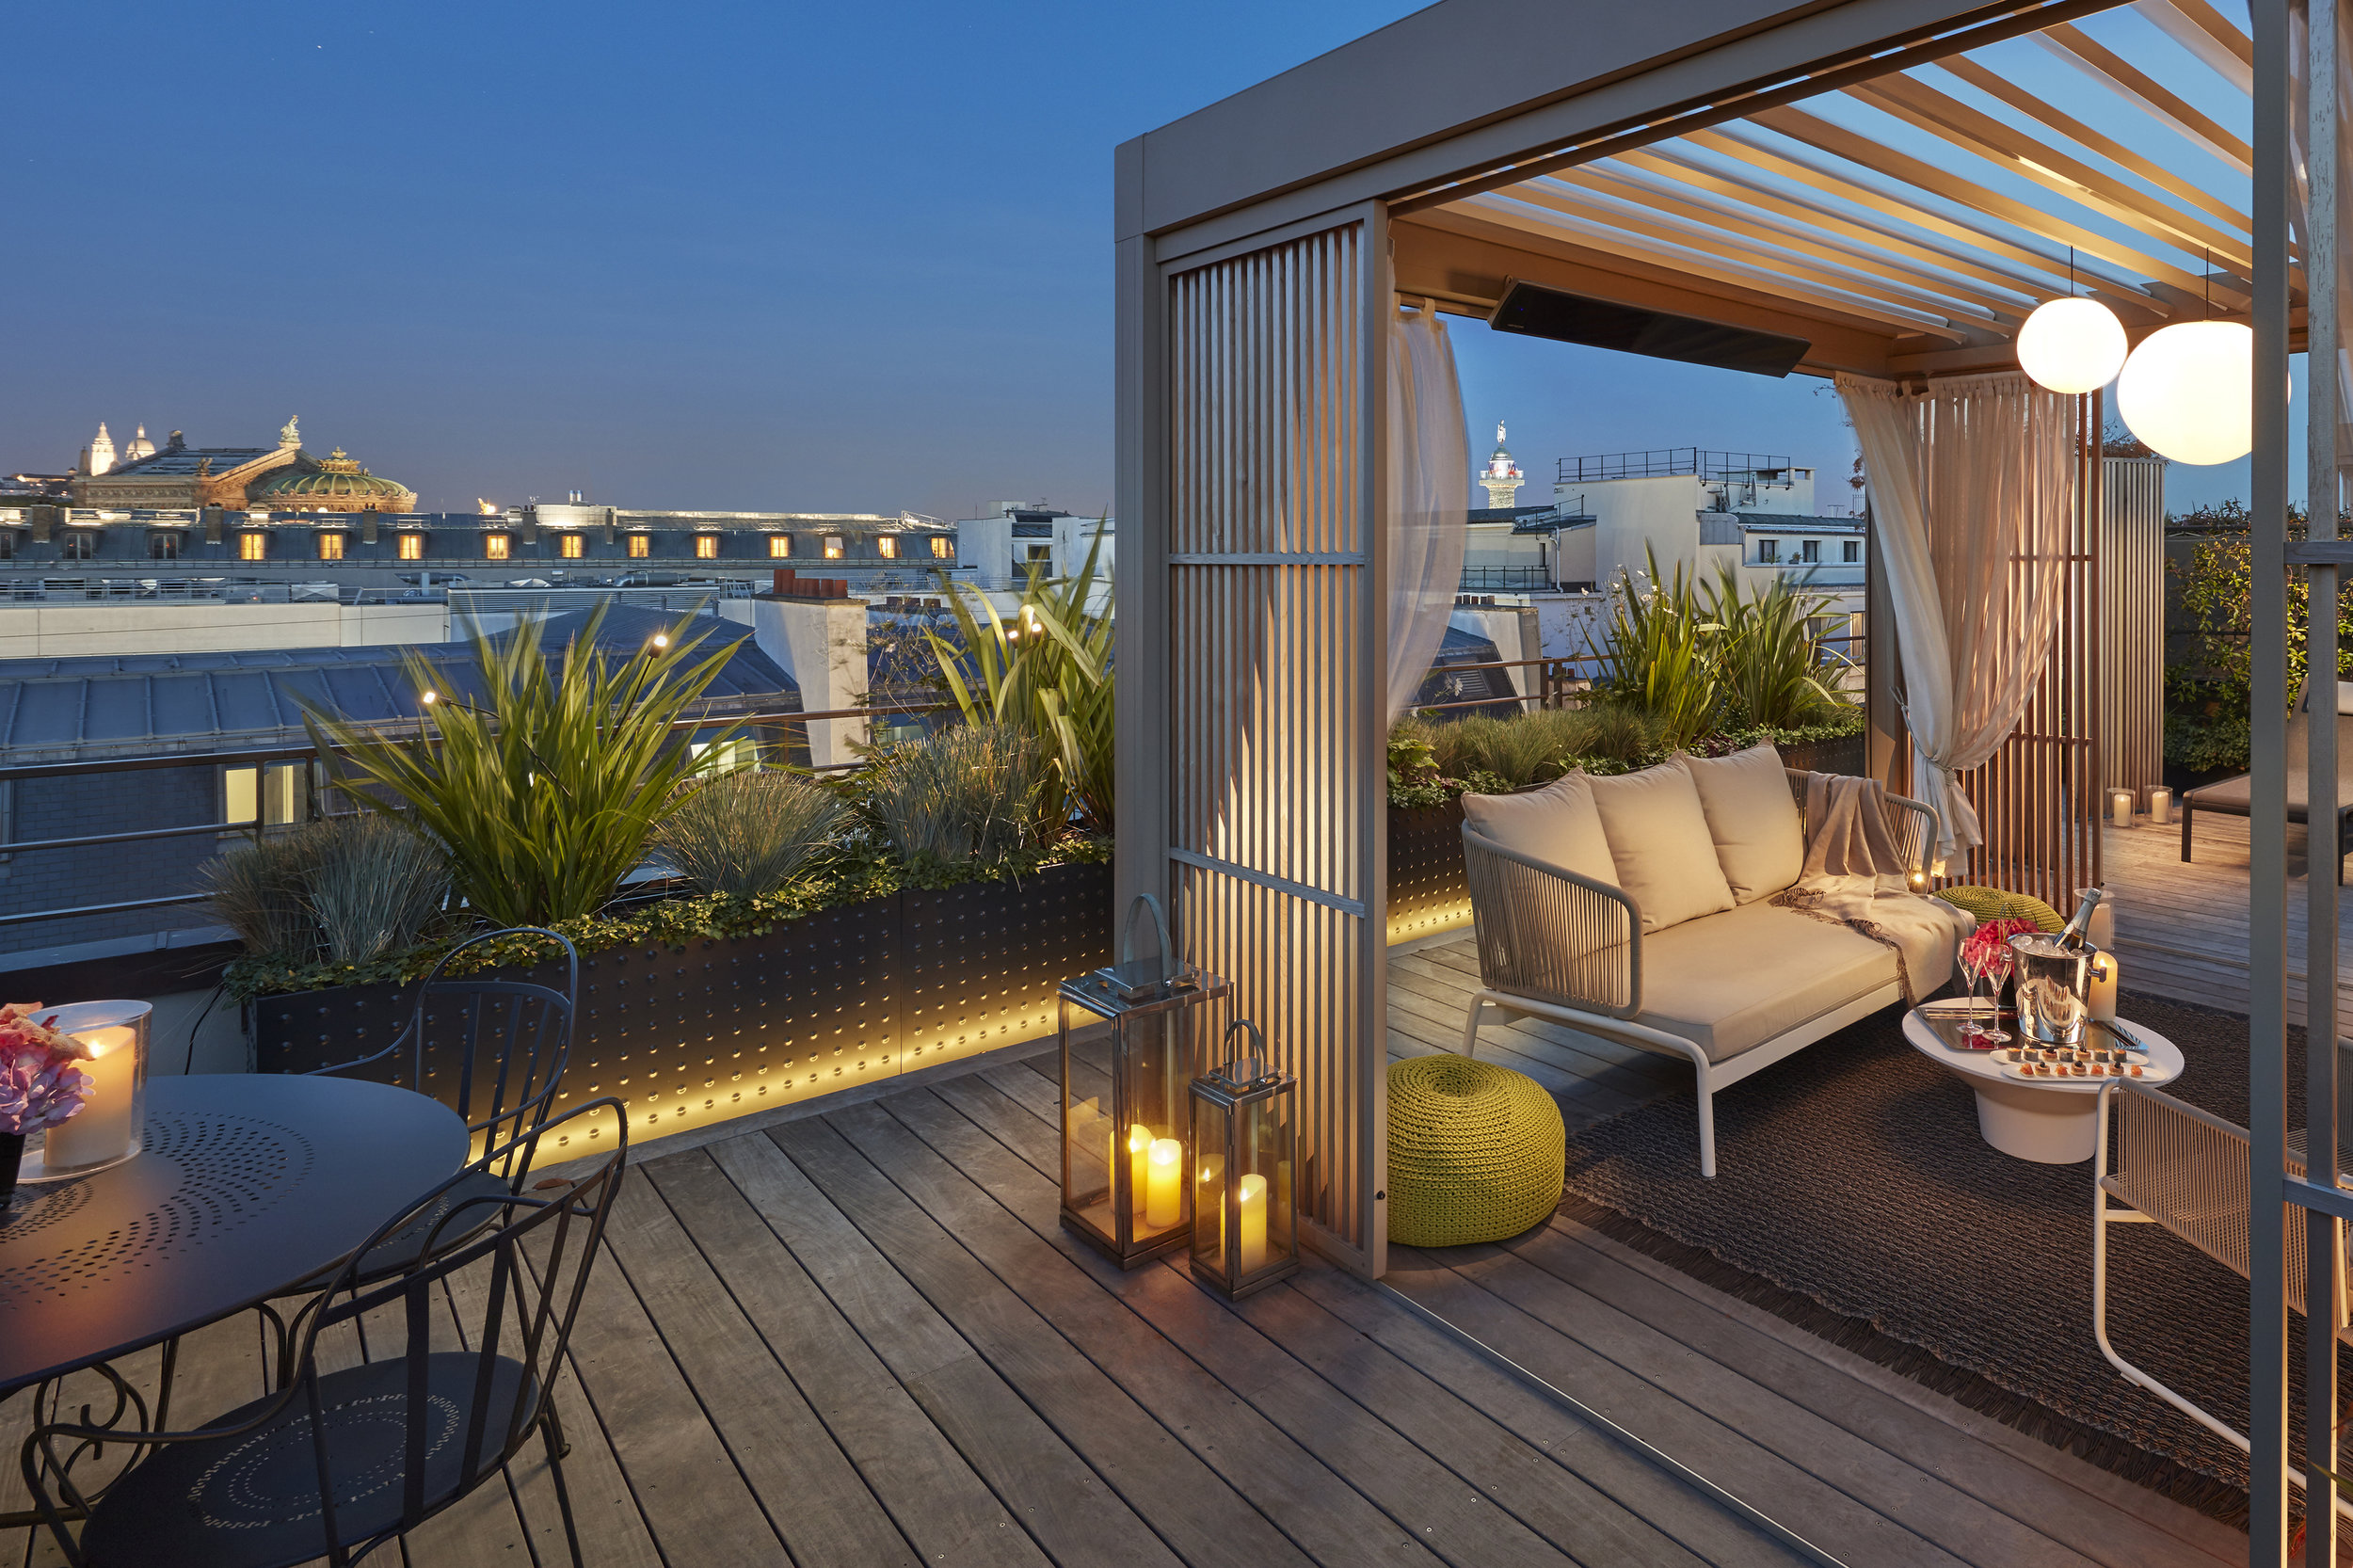 hotel_mandarin_oriental_paris_terraces_gardens_christophe_gautrand_landscape_designer_8.jpg